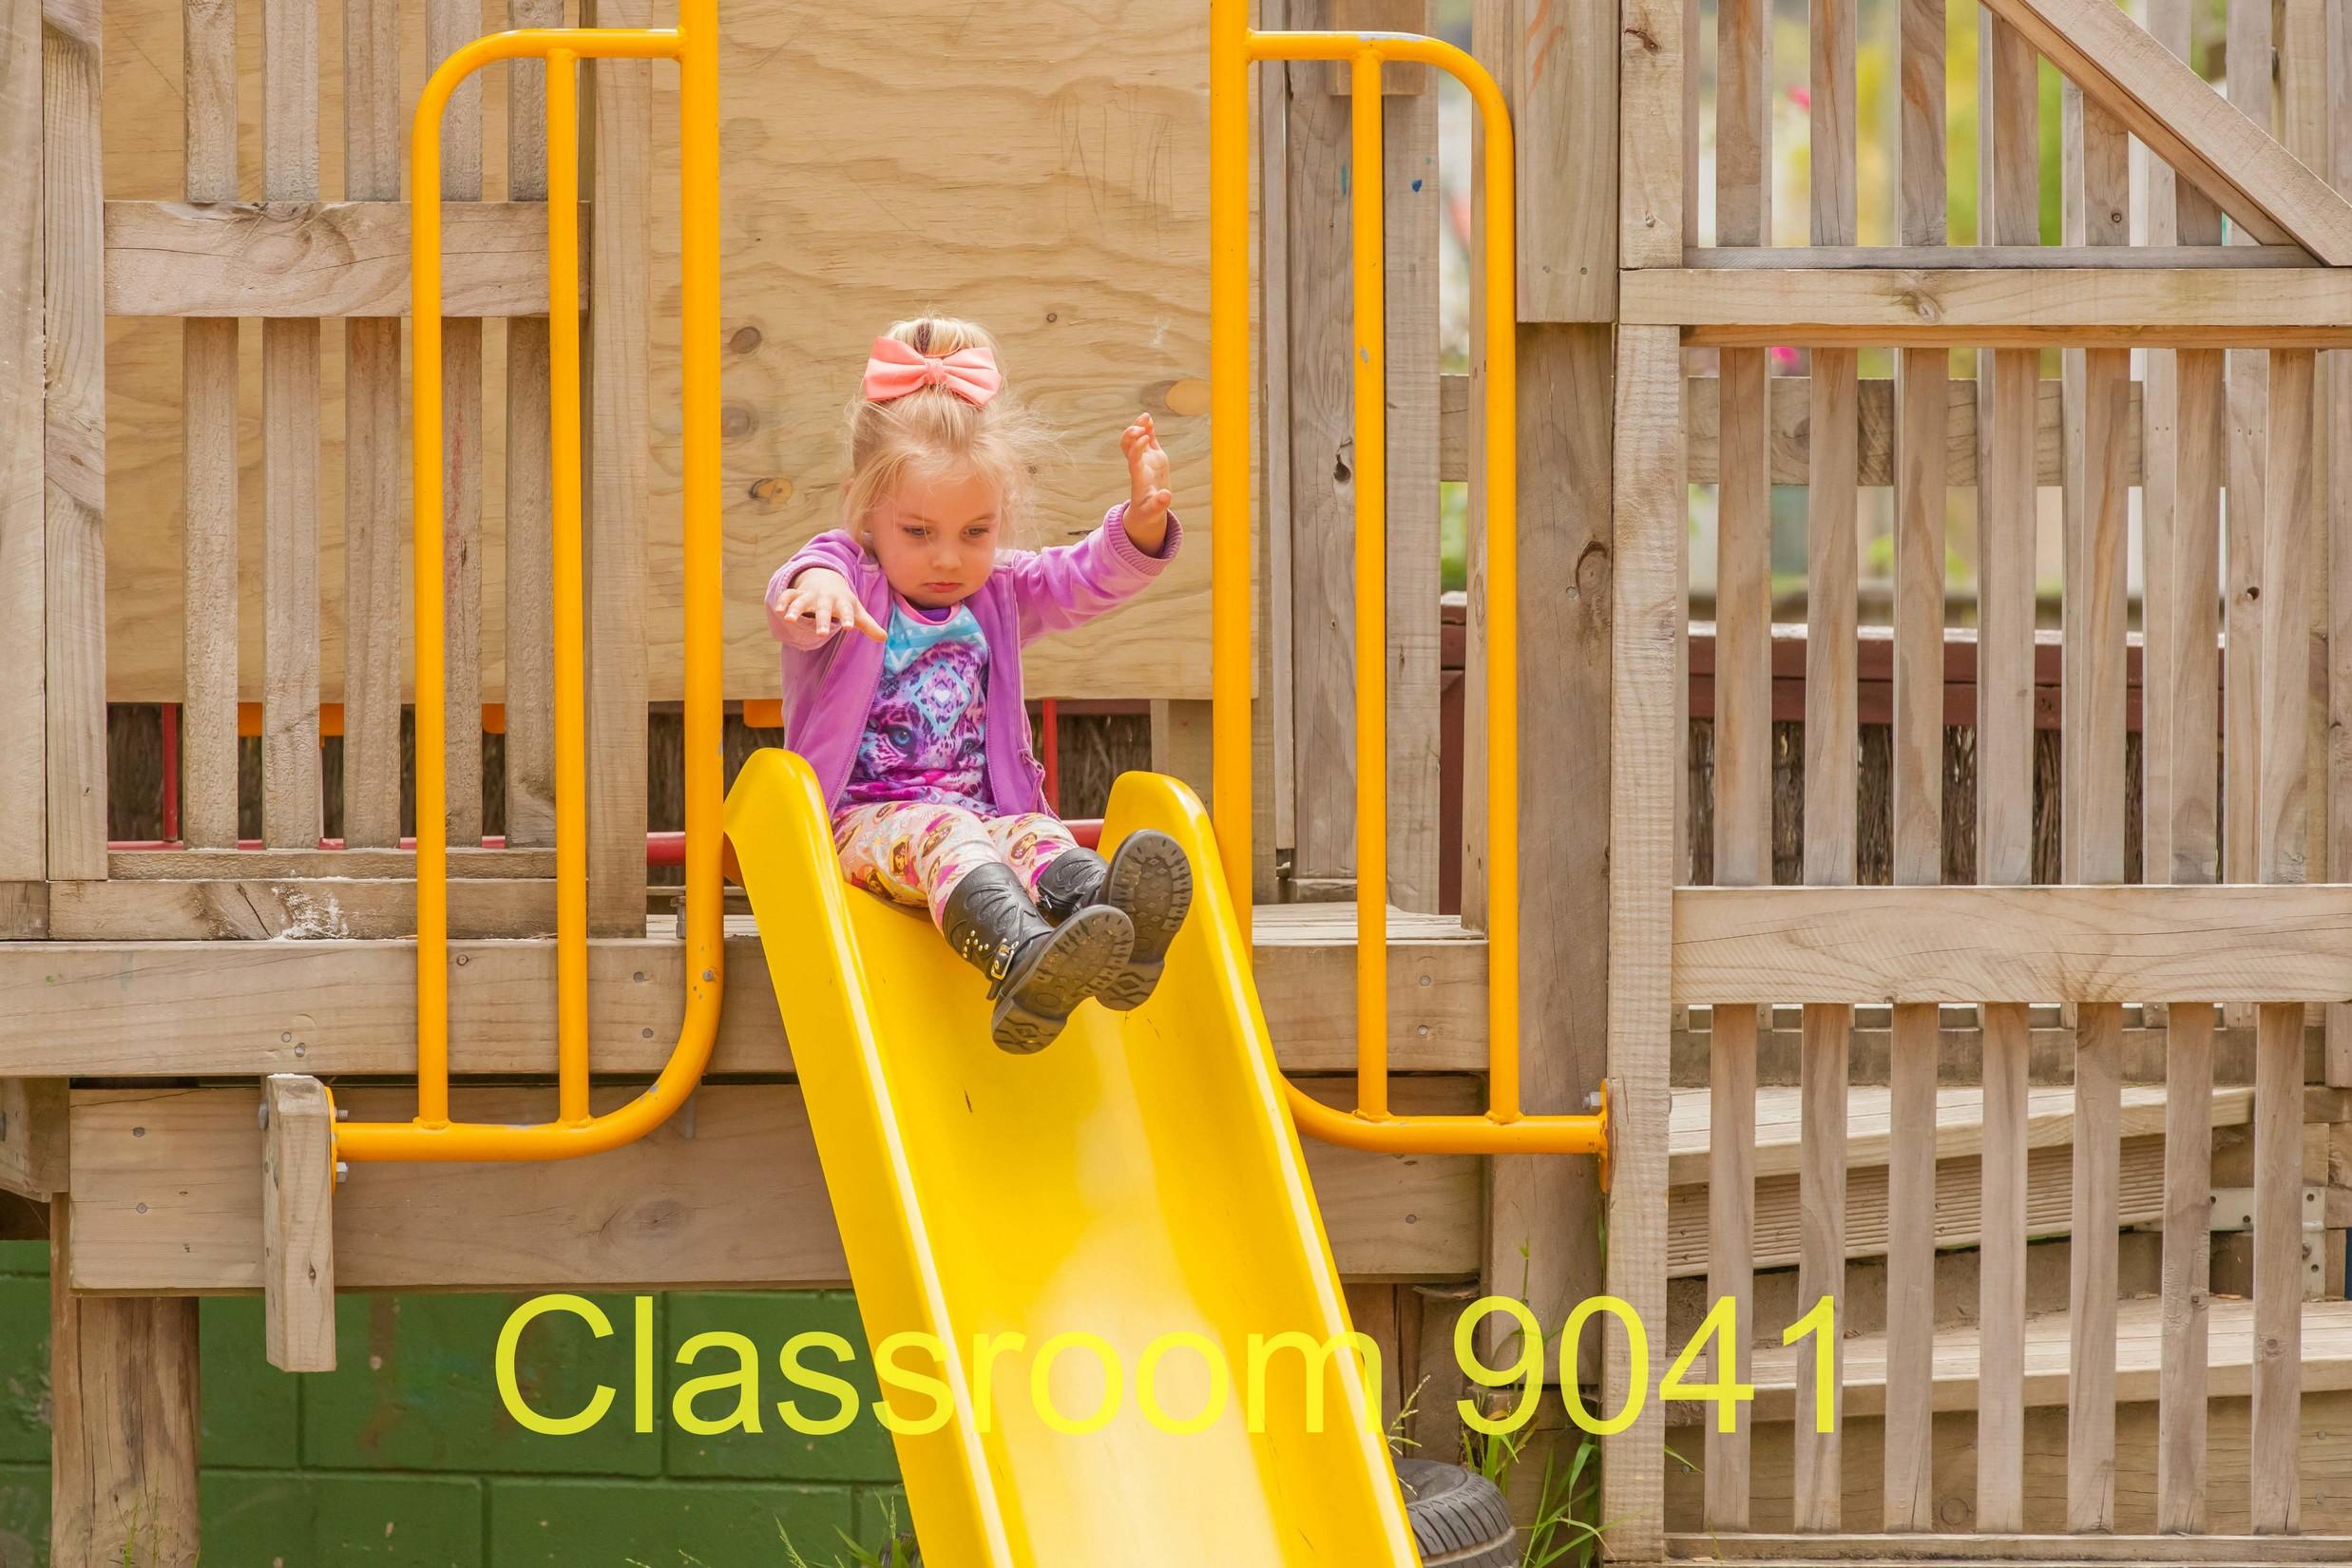 Classroom 9041